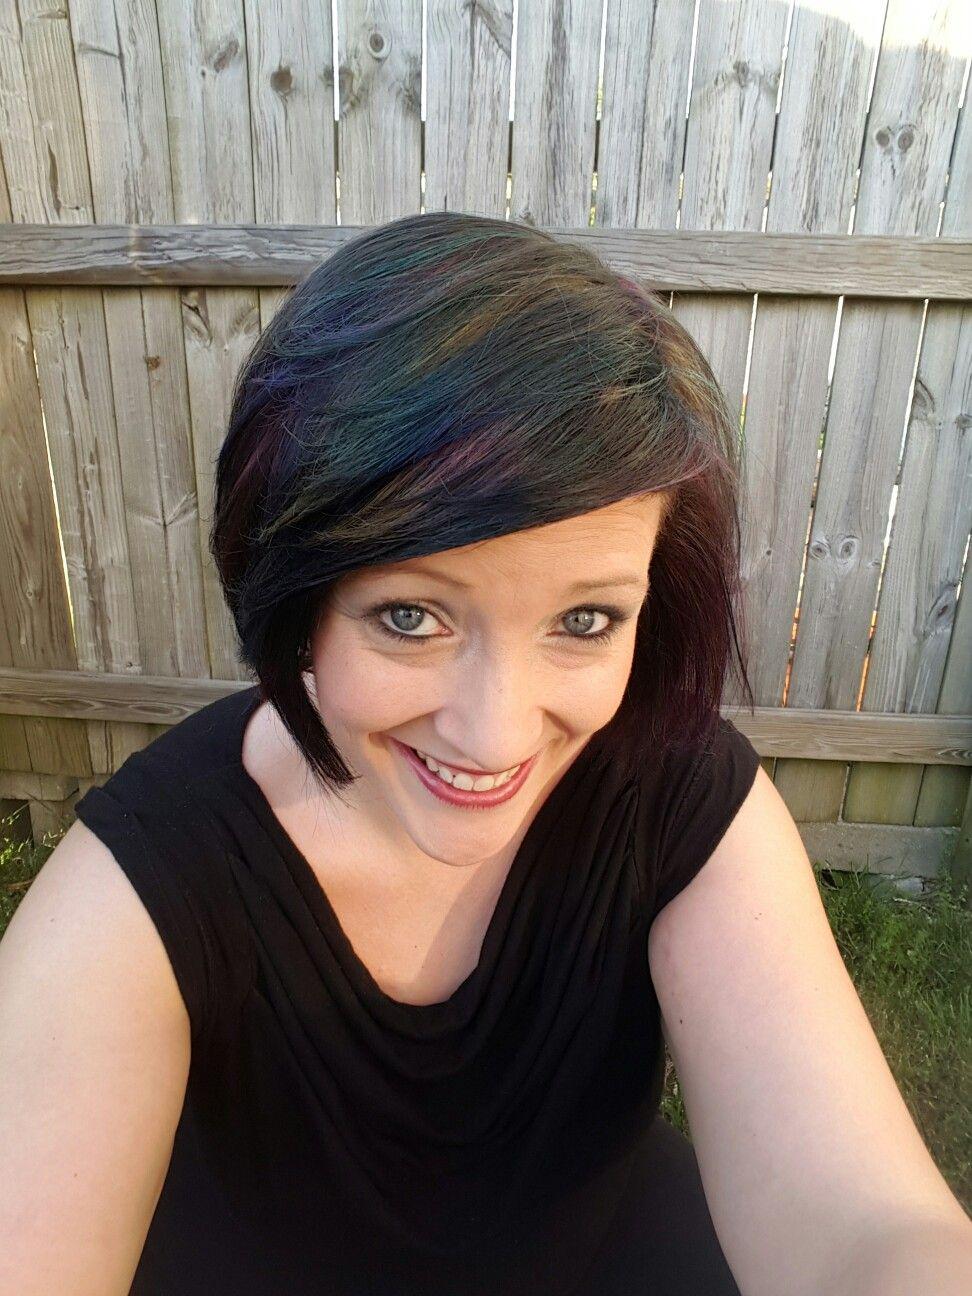 Oil Slick Rainbow Hair Color Short Hair Cut Black Base Pink Purple